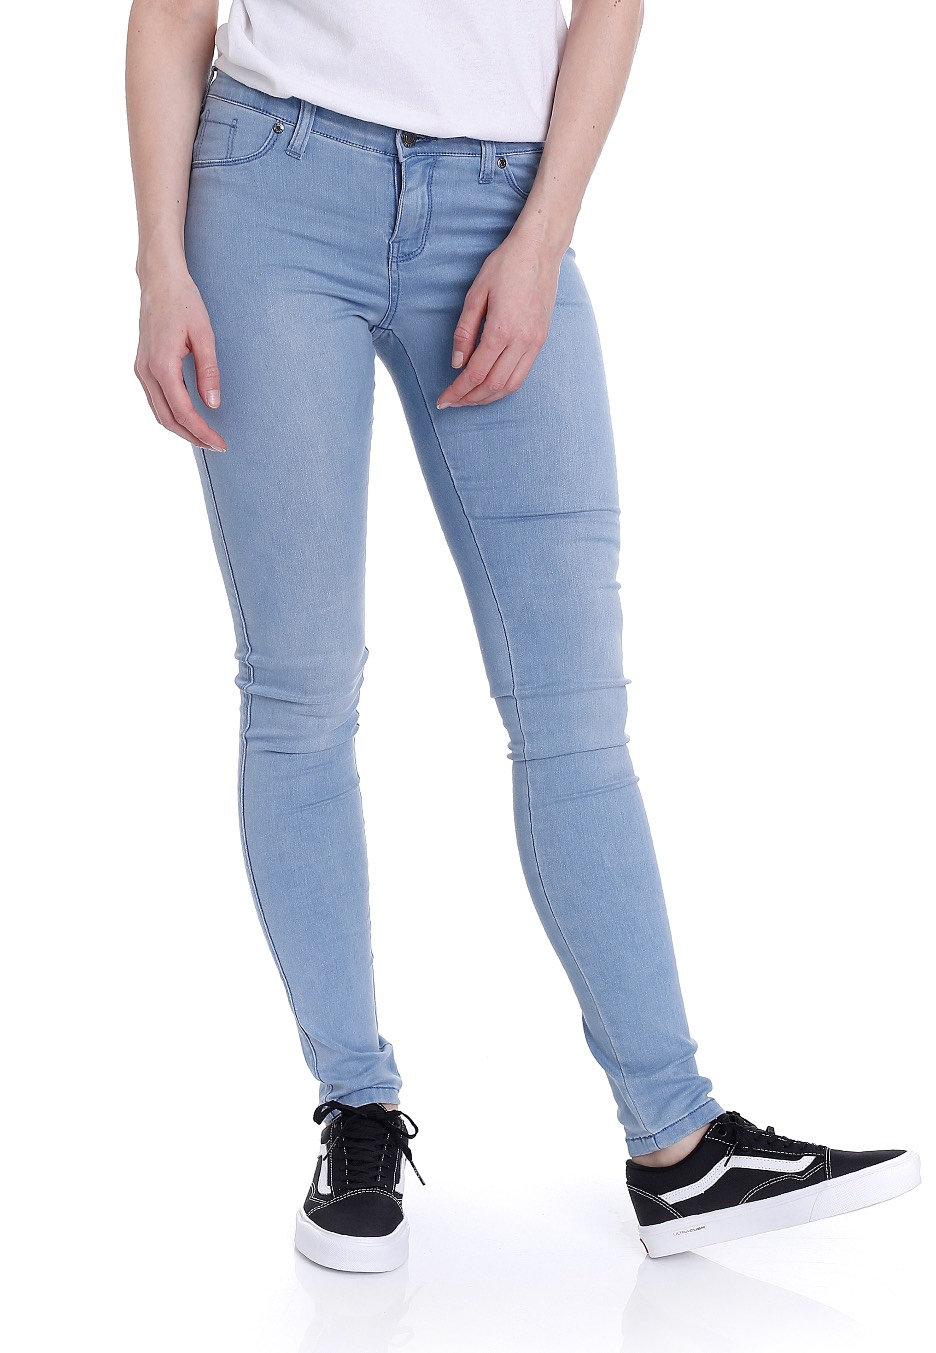 813bd9bb3f42f Dr. Denim - Kissy Light Blue - Jeggings - Streetwear Shop - Impericon.com UK